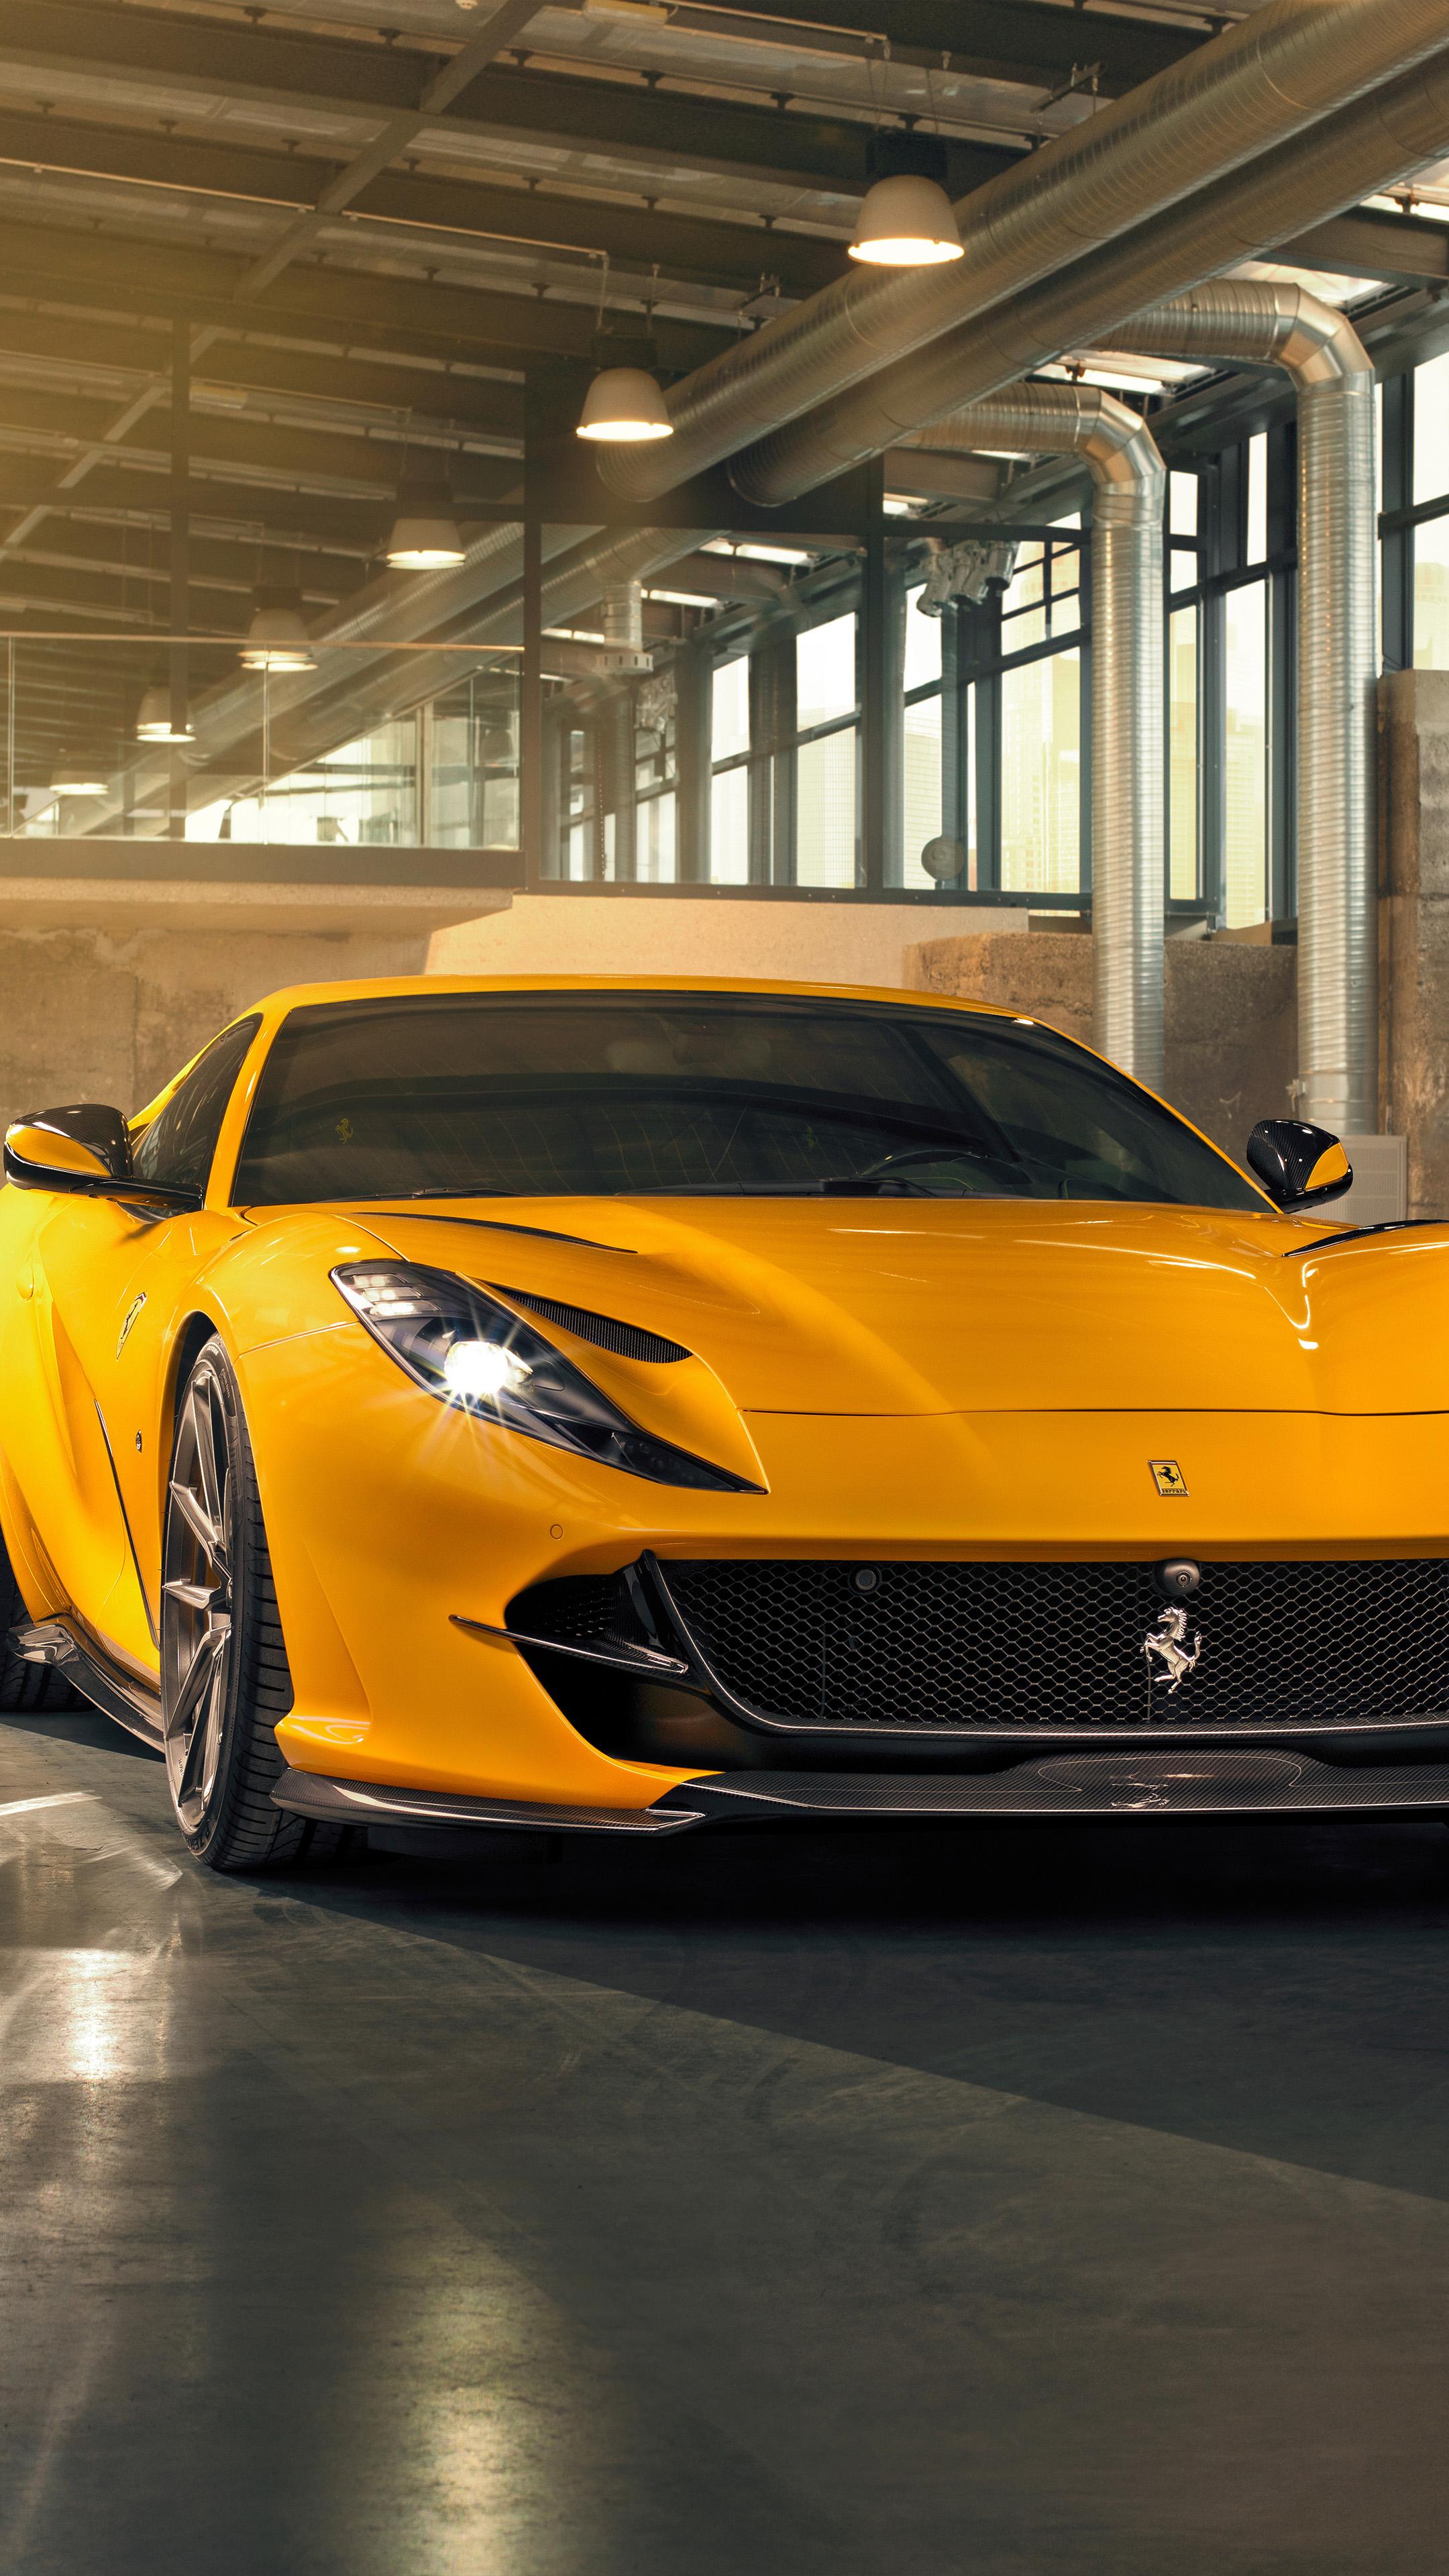 Yellow Ferrari 812 Superfast 2019 Free 4K Ultra HD Mobile ...